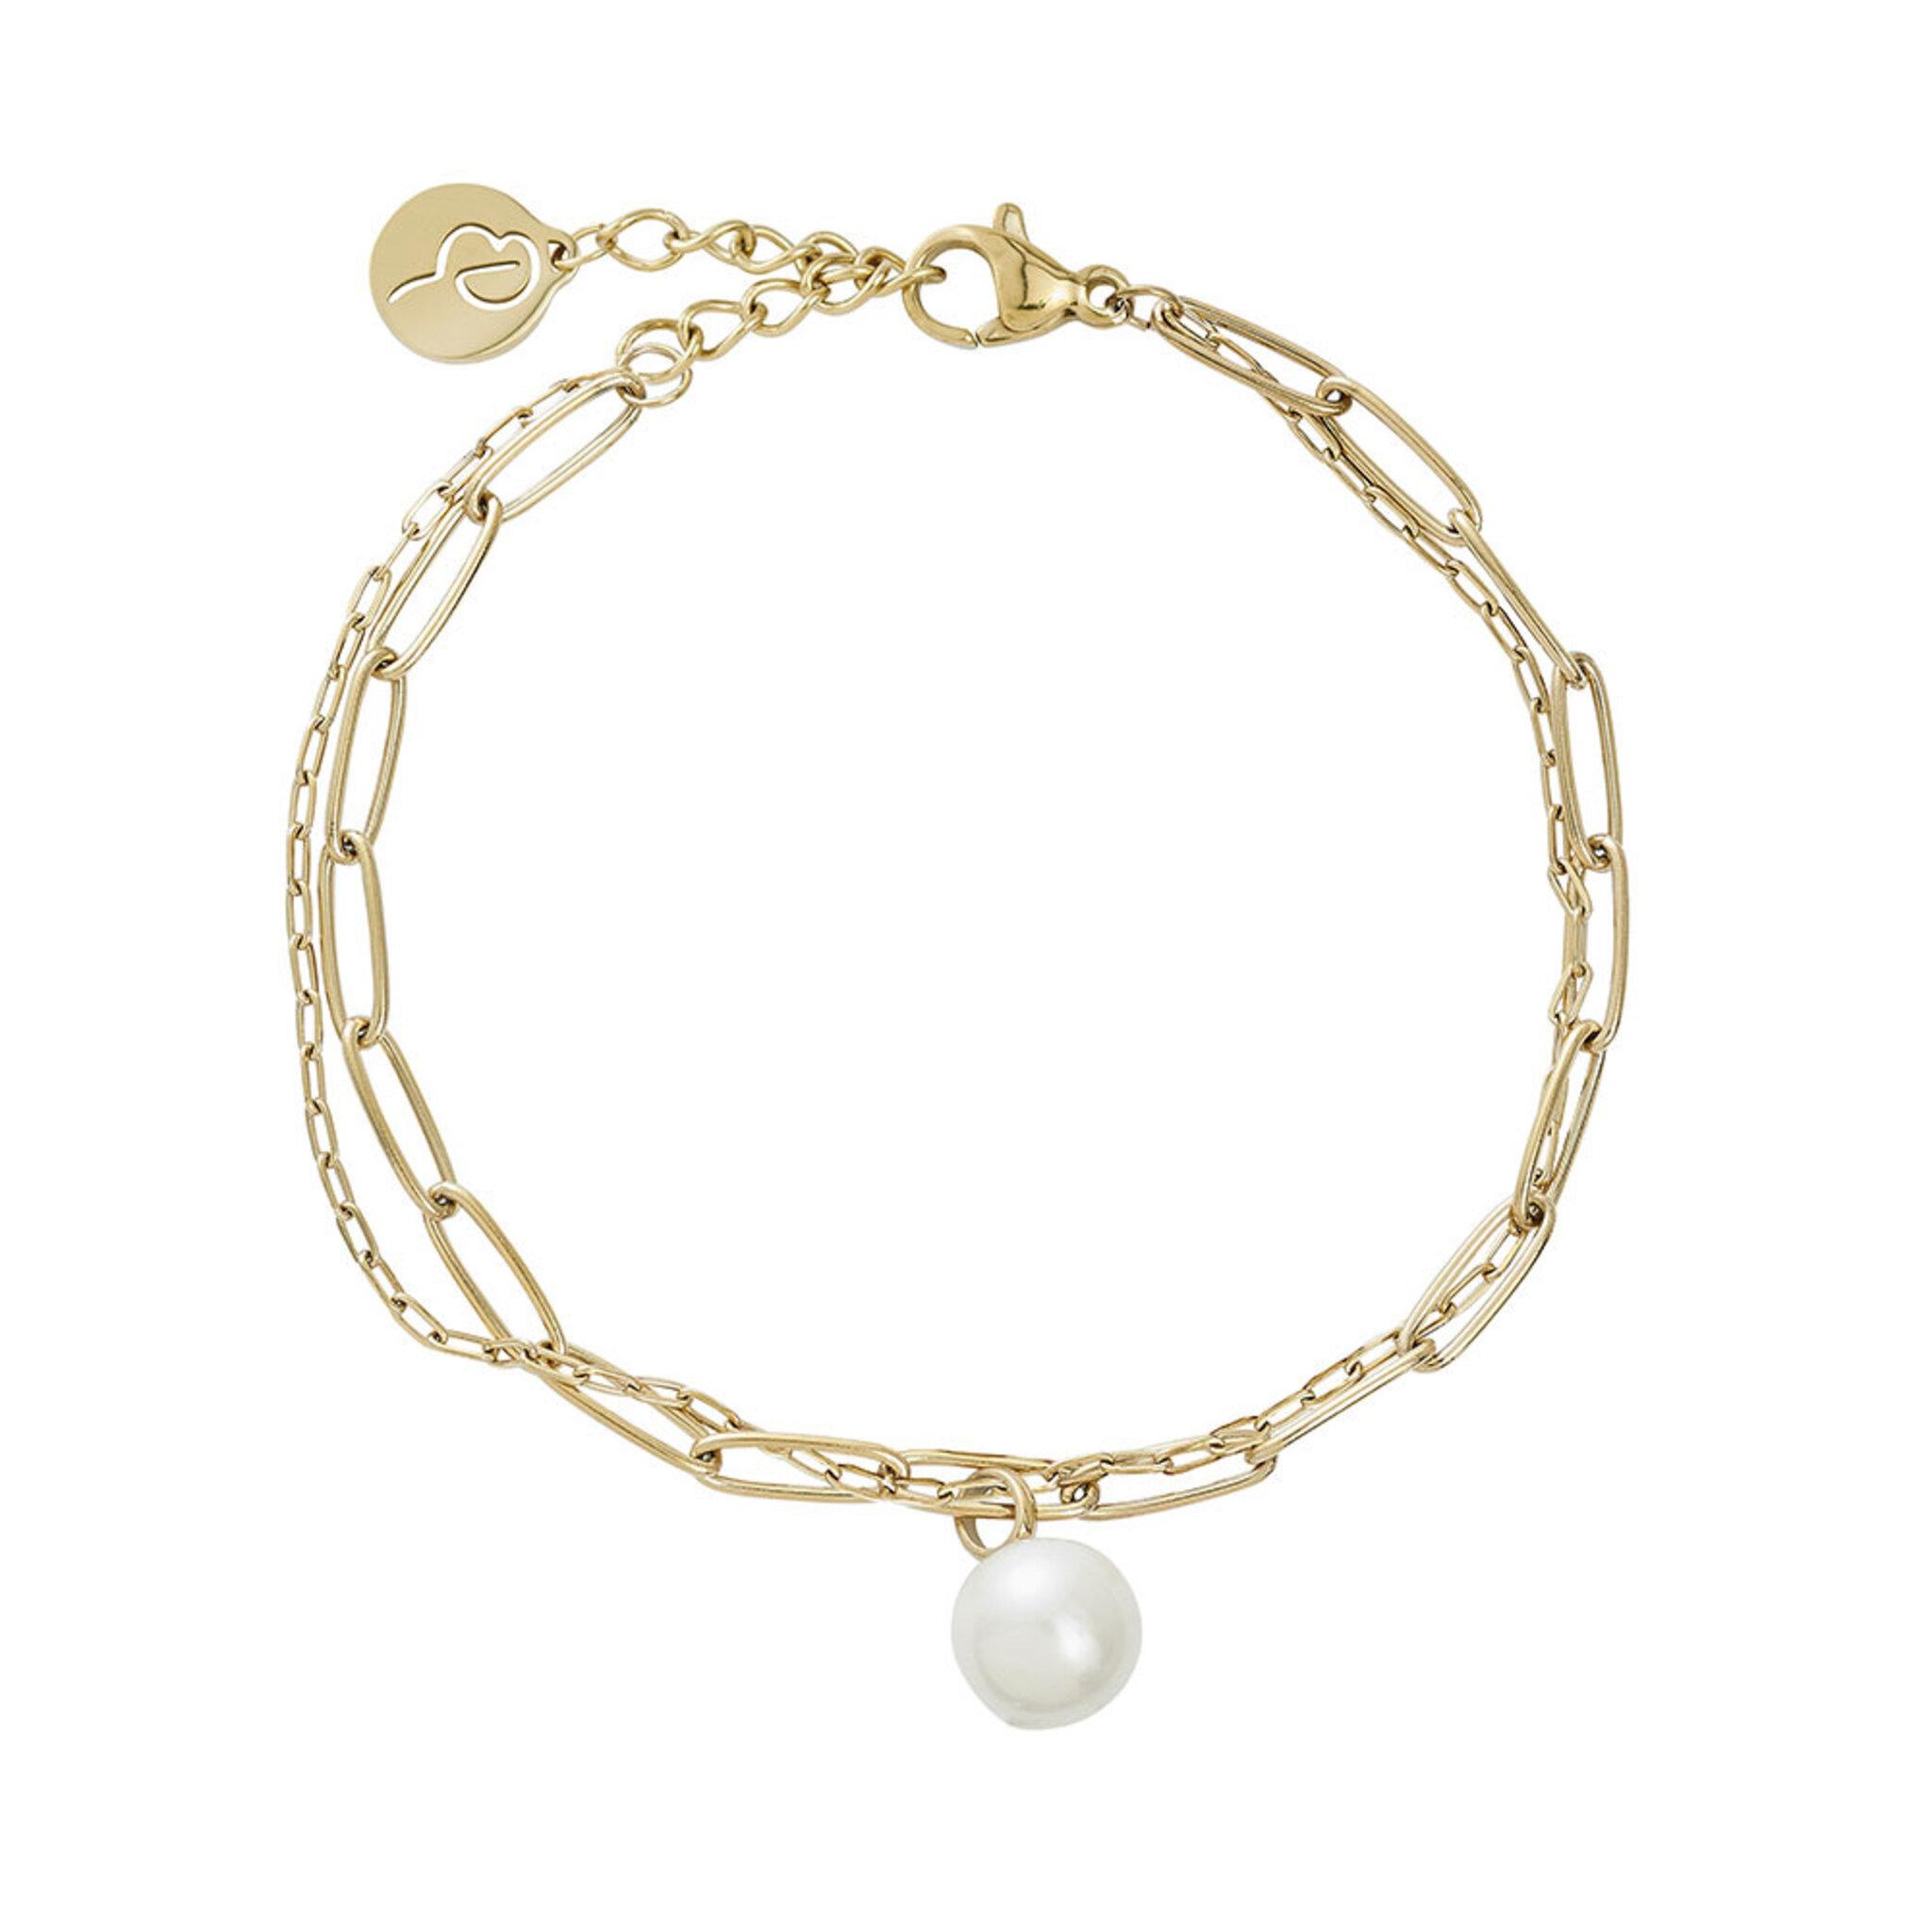 Berzelii Bracelet Layered Gold, ONE SIZE